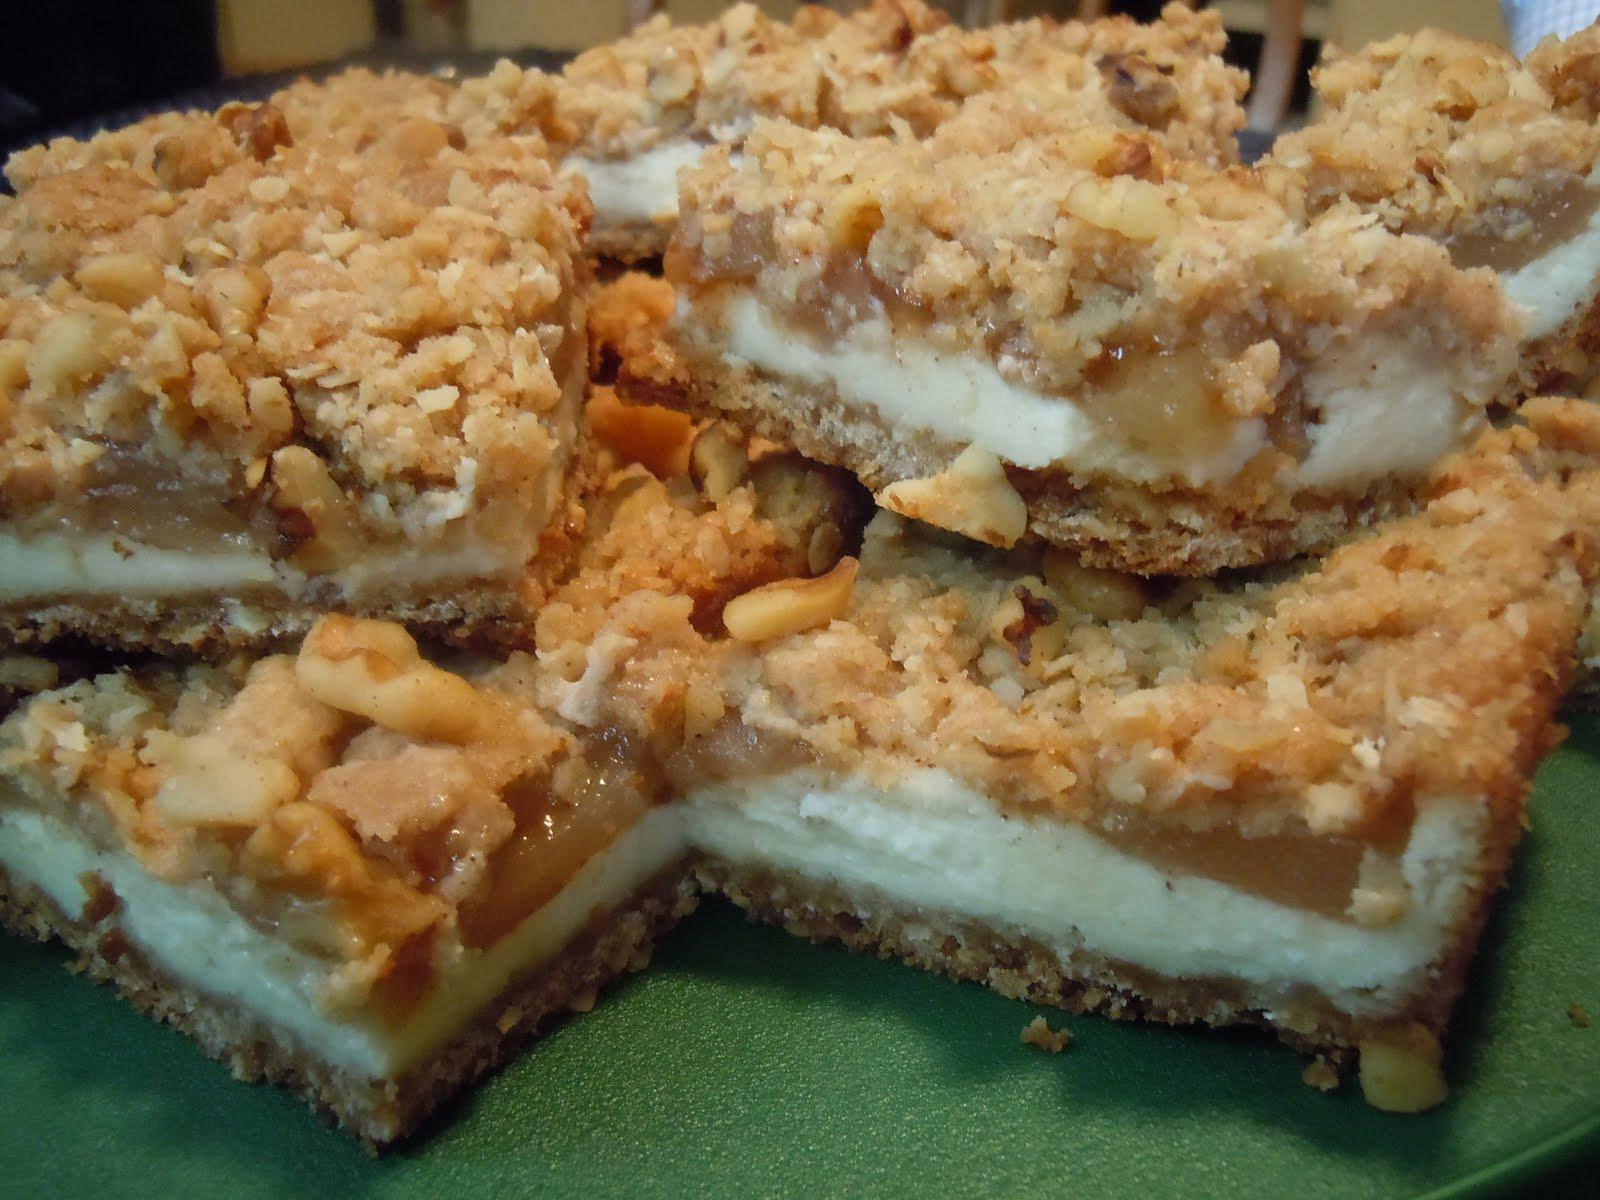 The Savvy Kitchen: Apple Streusel Cheesecake Bars